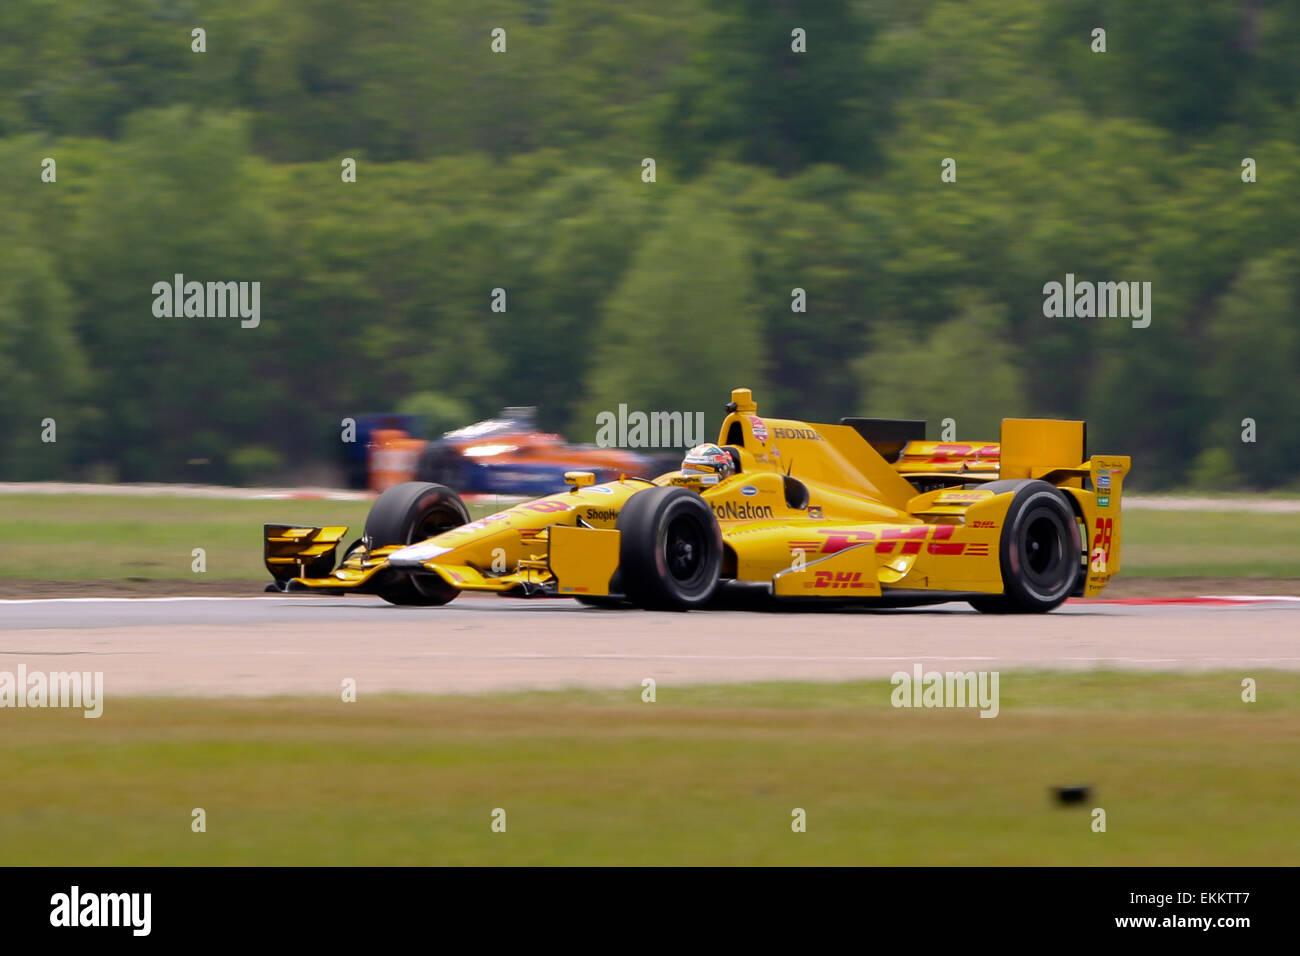 Avondale, LA, USA. 11. April 2015. #28 Ryan Hunter-Reay Andretti Autosport während des Indy Grand Prix von Stockbild